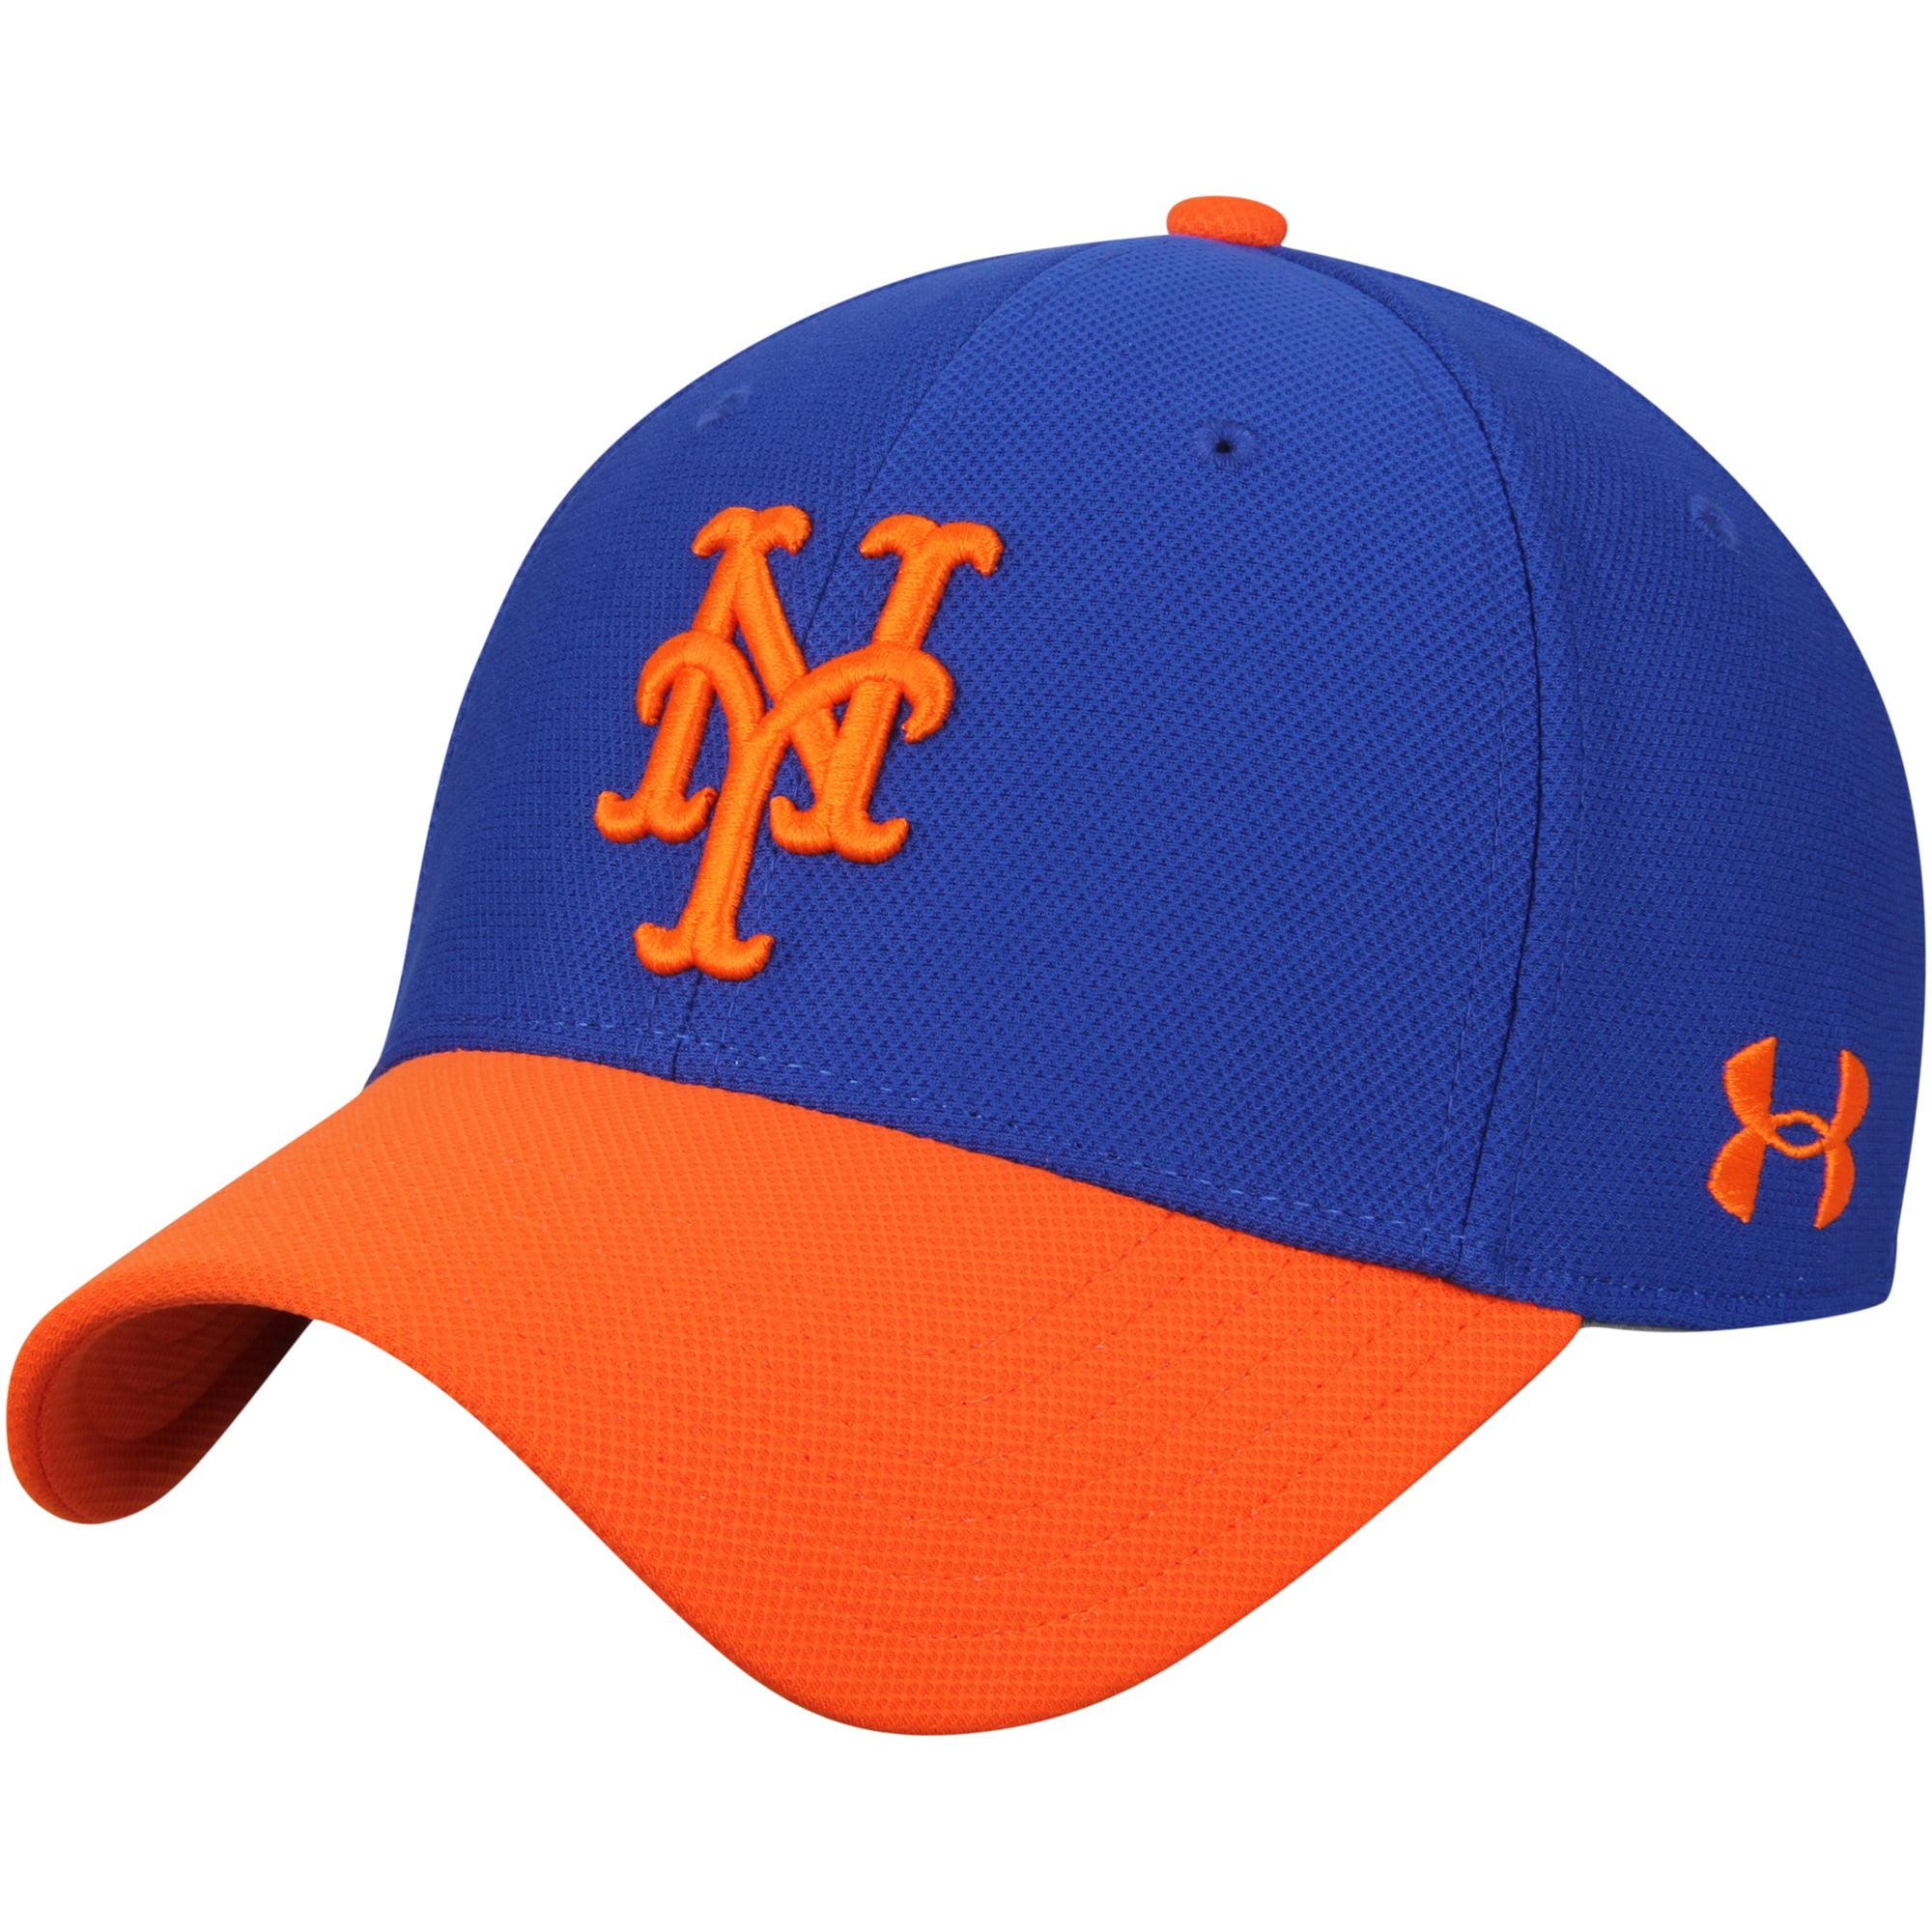 big sale be383 c5219 ... greece new york mets under armour blitzing performance adjustable hat  royal orange osfa f96a4 98a9f ...